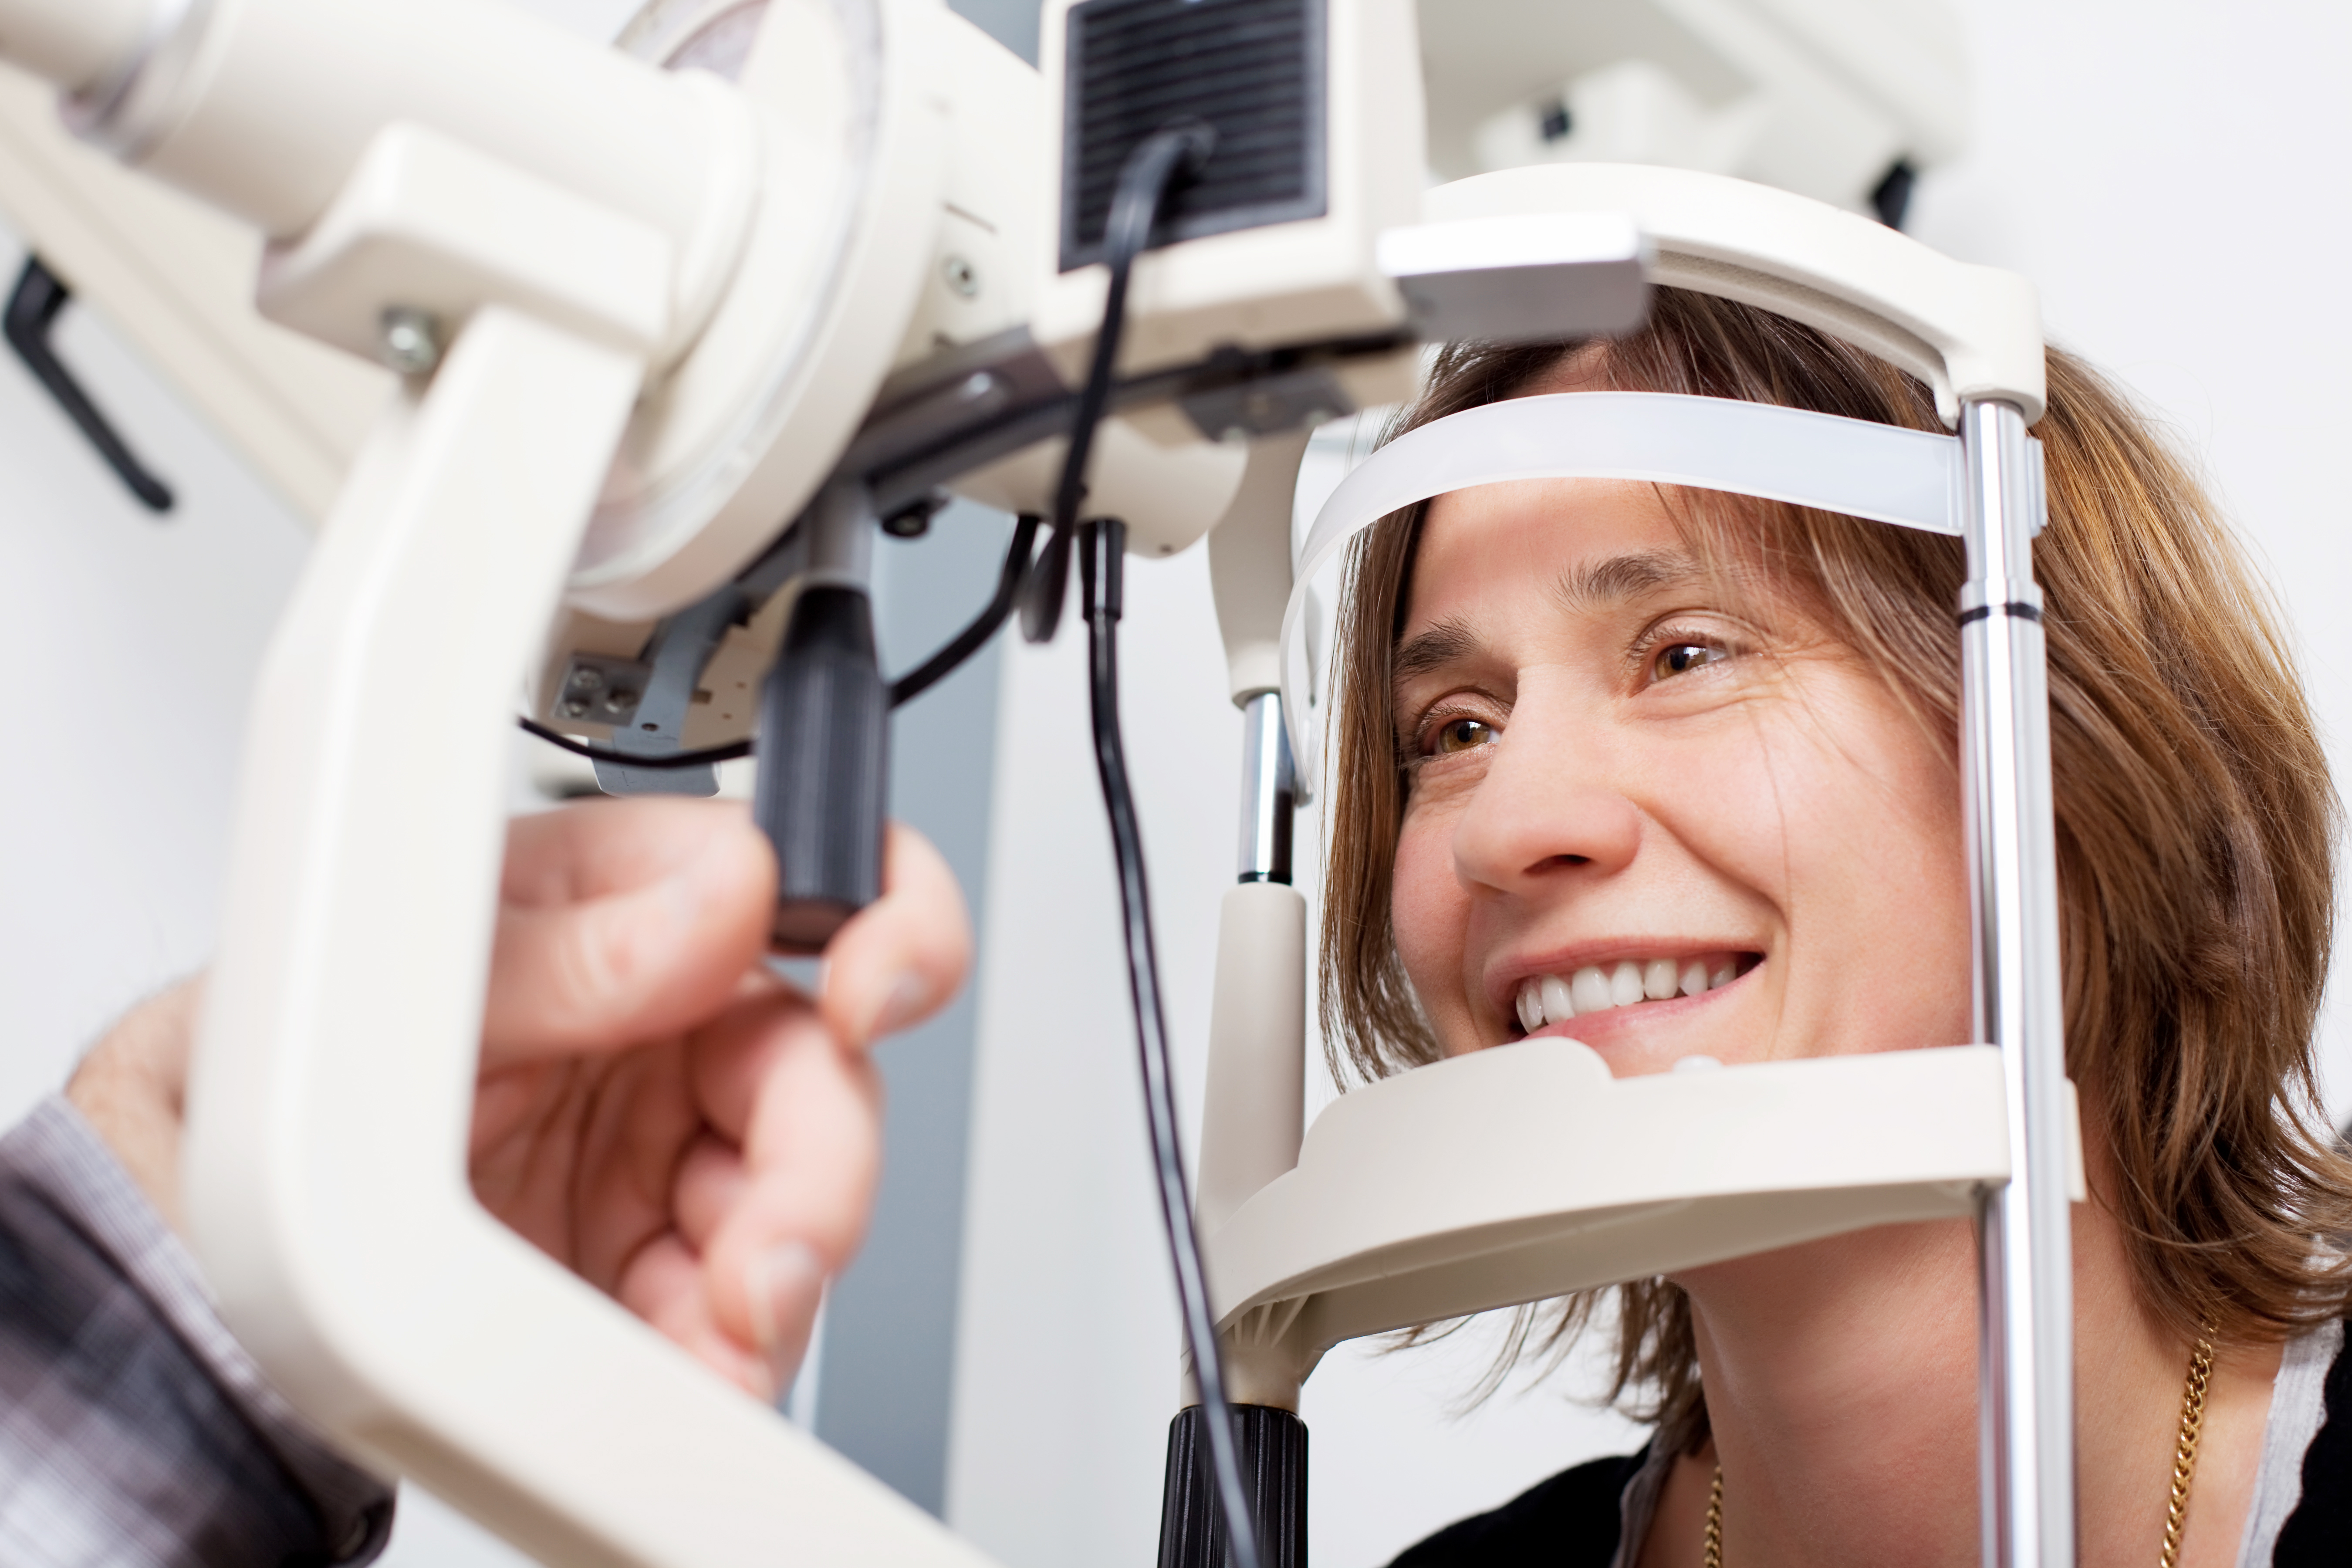 Lady having her eye test